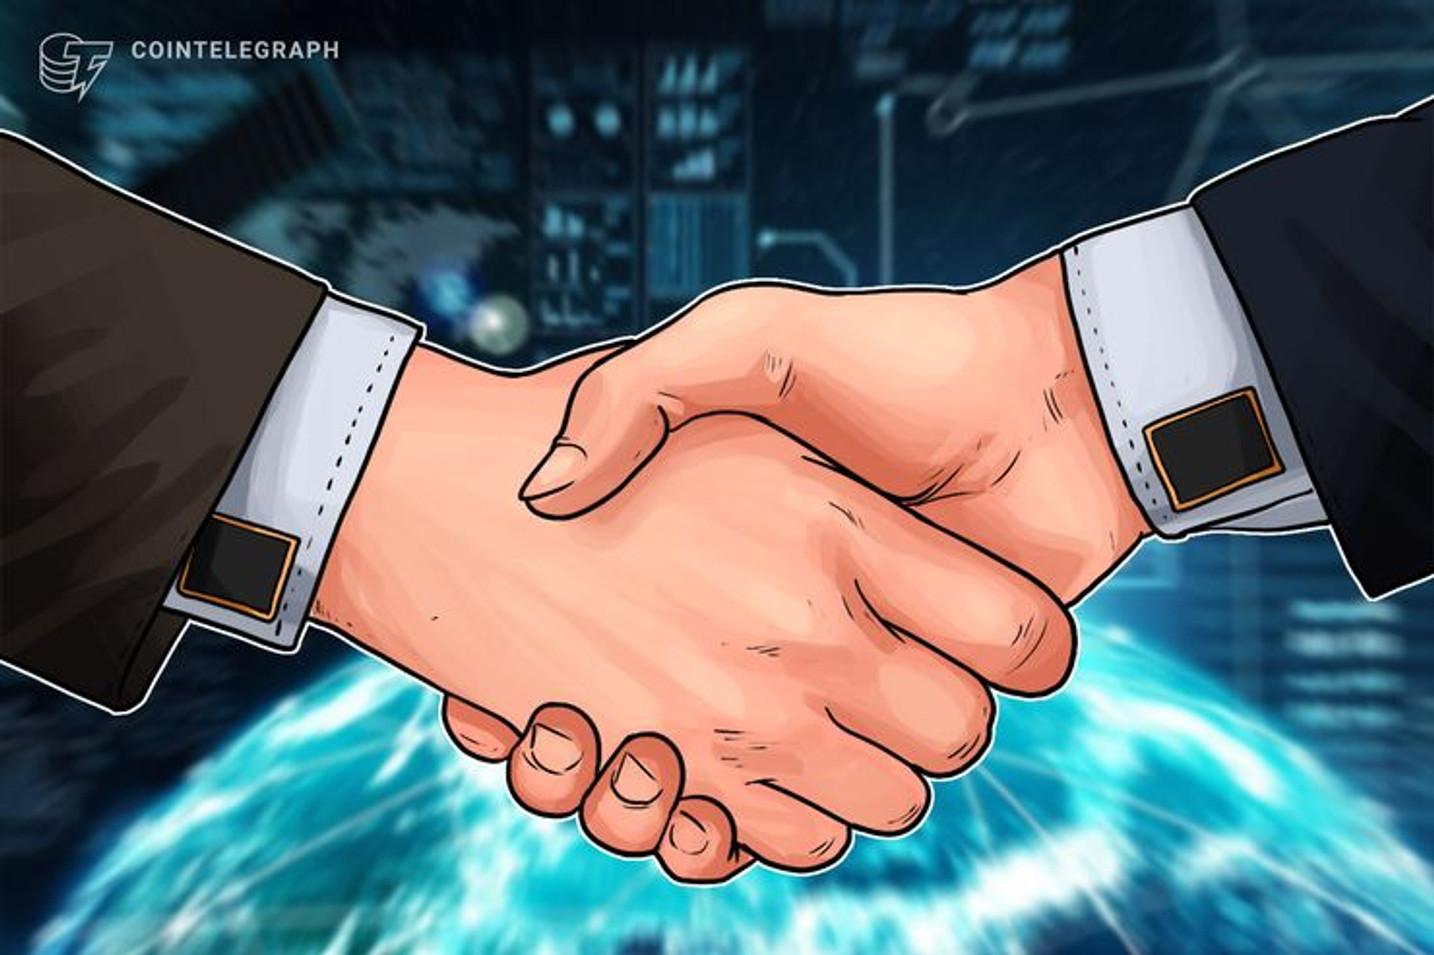 España: Blockchain Murcia firma acuerdo de colaboración con Asociación de Jóvenes Empresarios